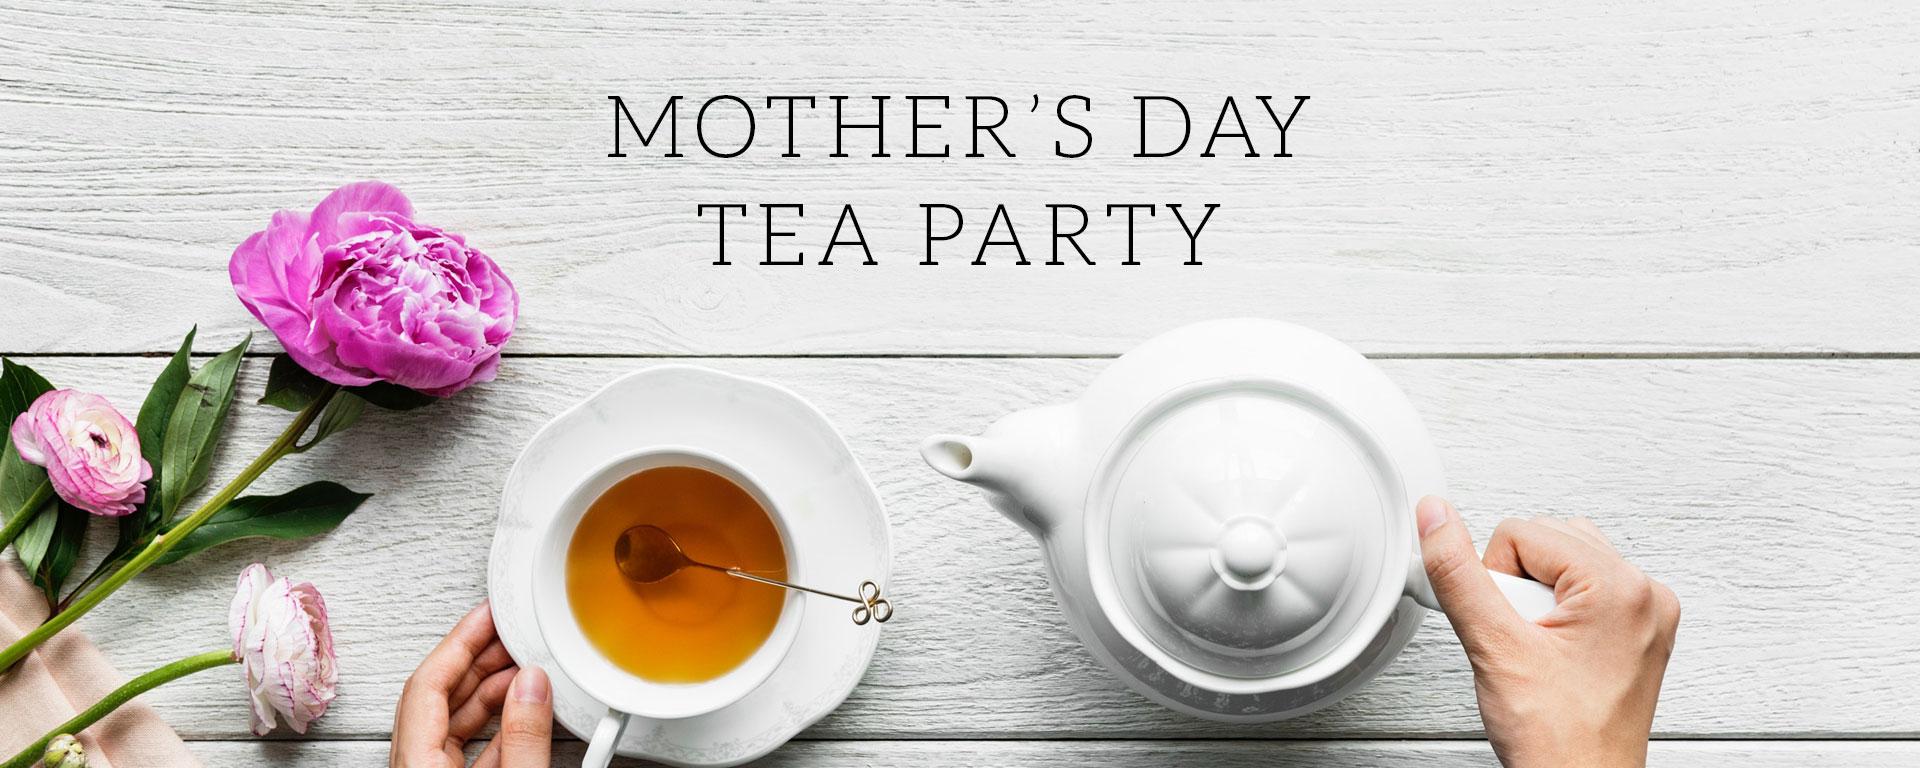 Tea Party \u2014 Storyline Church